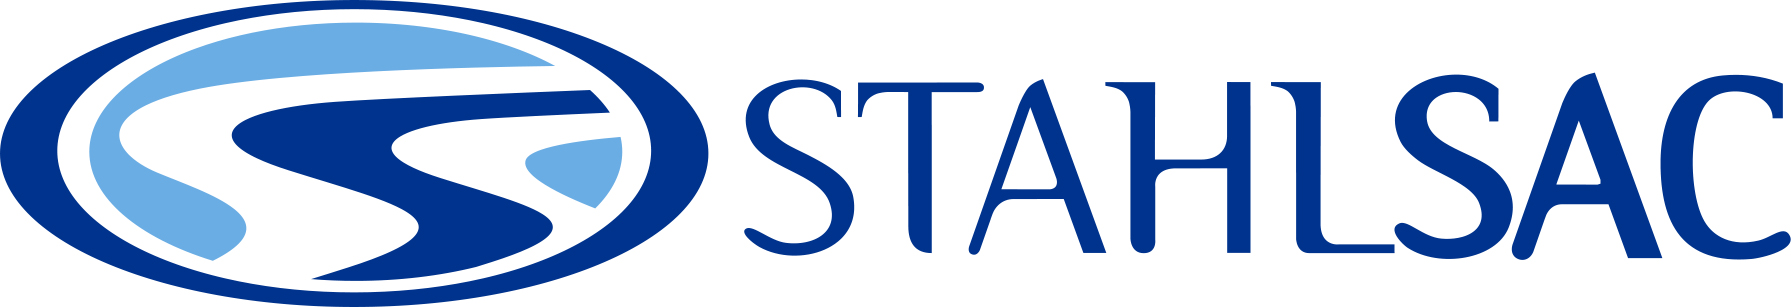 Stahlsac Logo.jpg